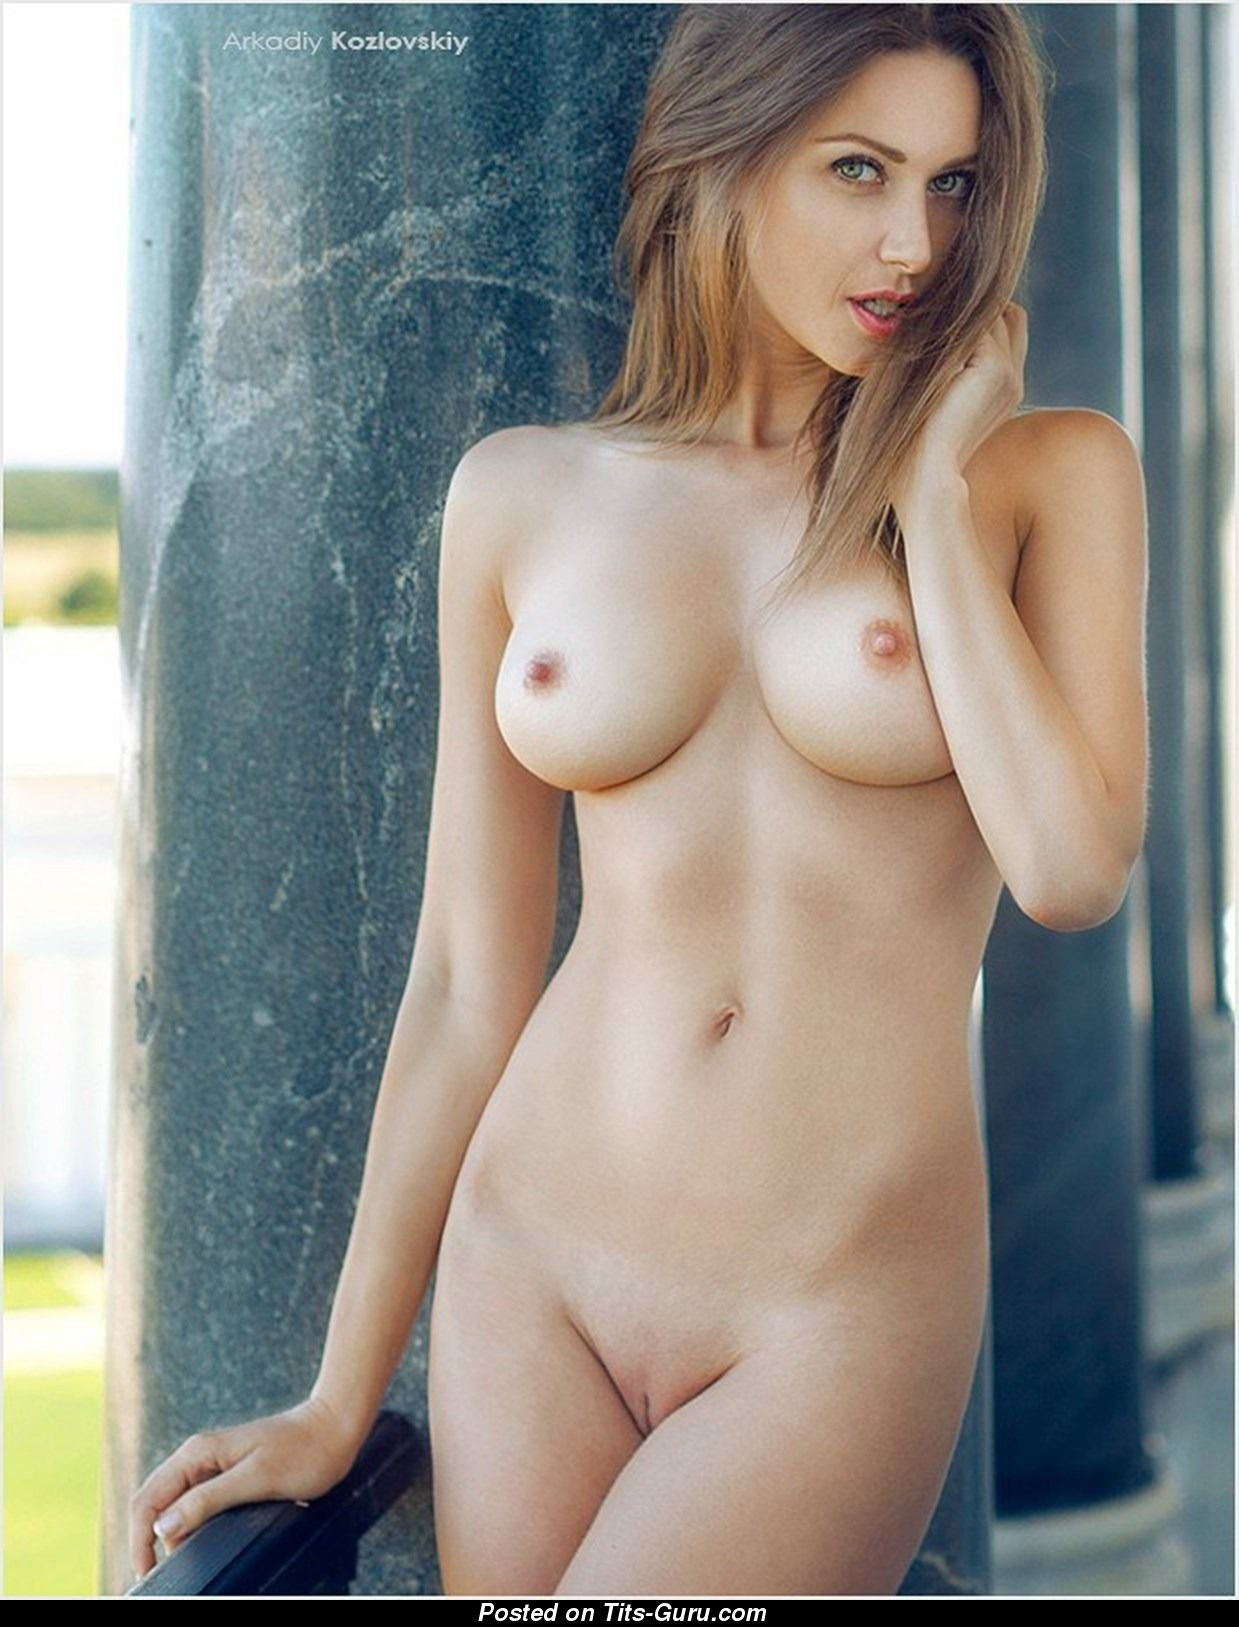 Porno Olga Alberti nudes (86 foto and video), Ass, Cleavage, Boobs, braless 2017